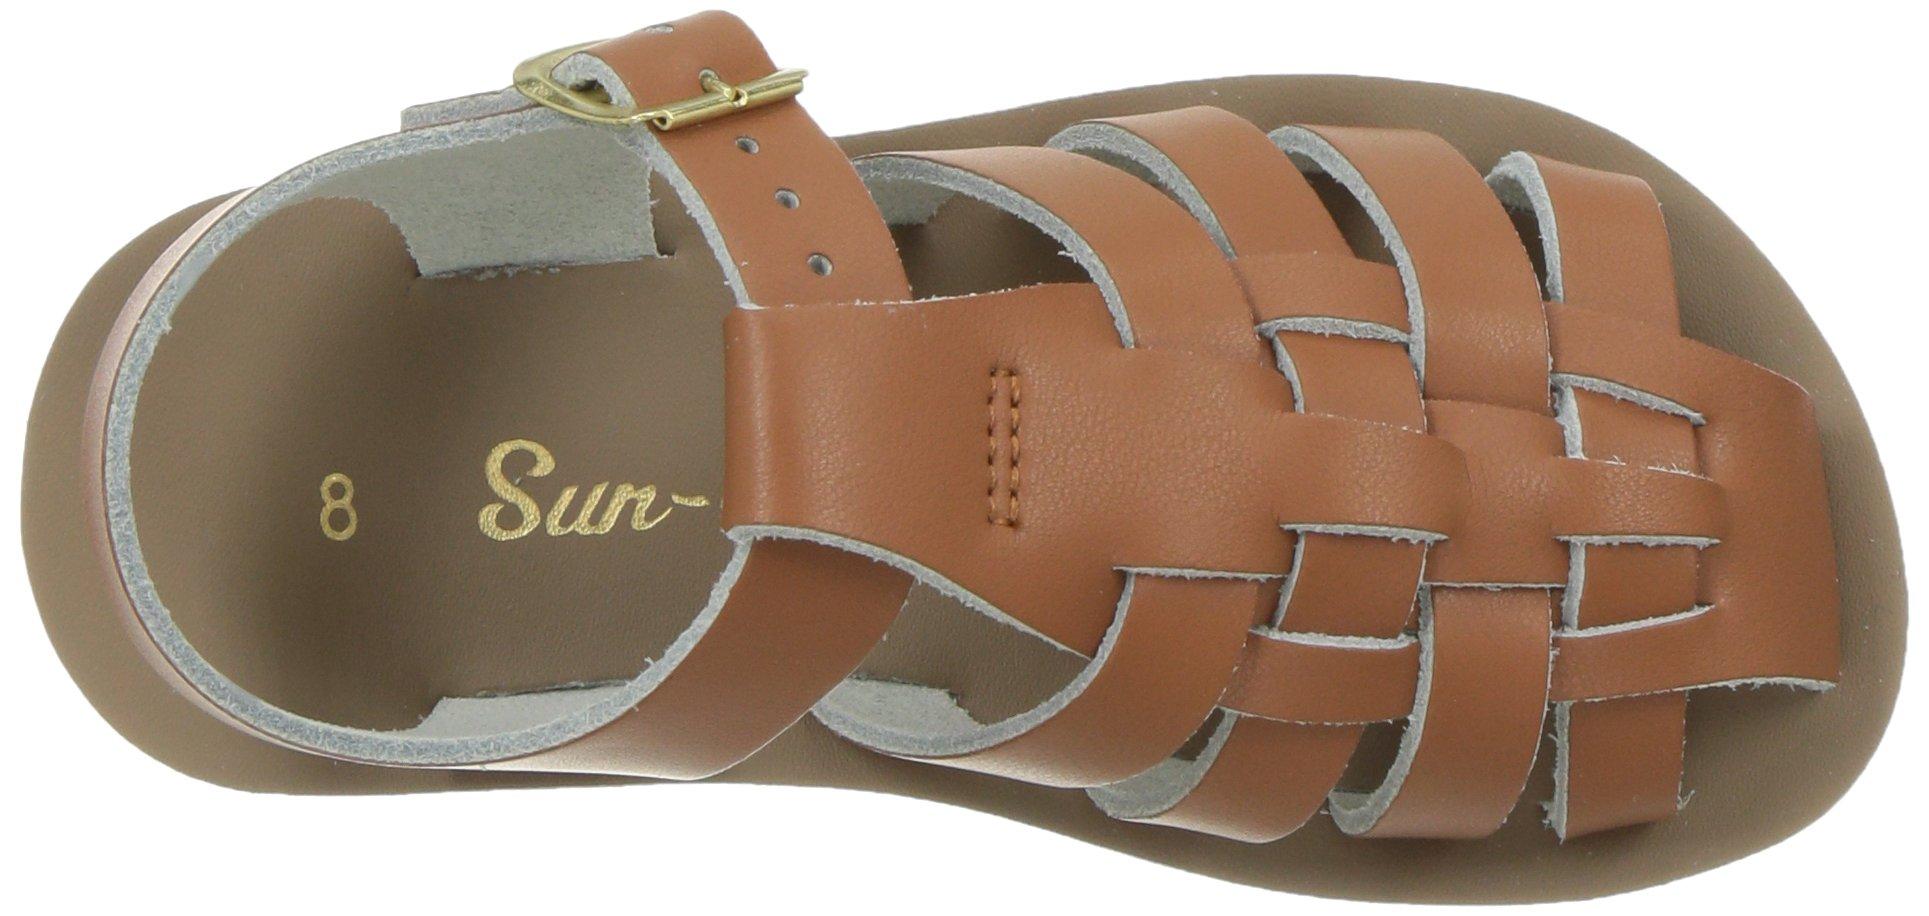 f6f1c4b4a943 Salt Water Sandals by Hoy Shoe Baby Sun-San Sailor Flat Sandal